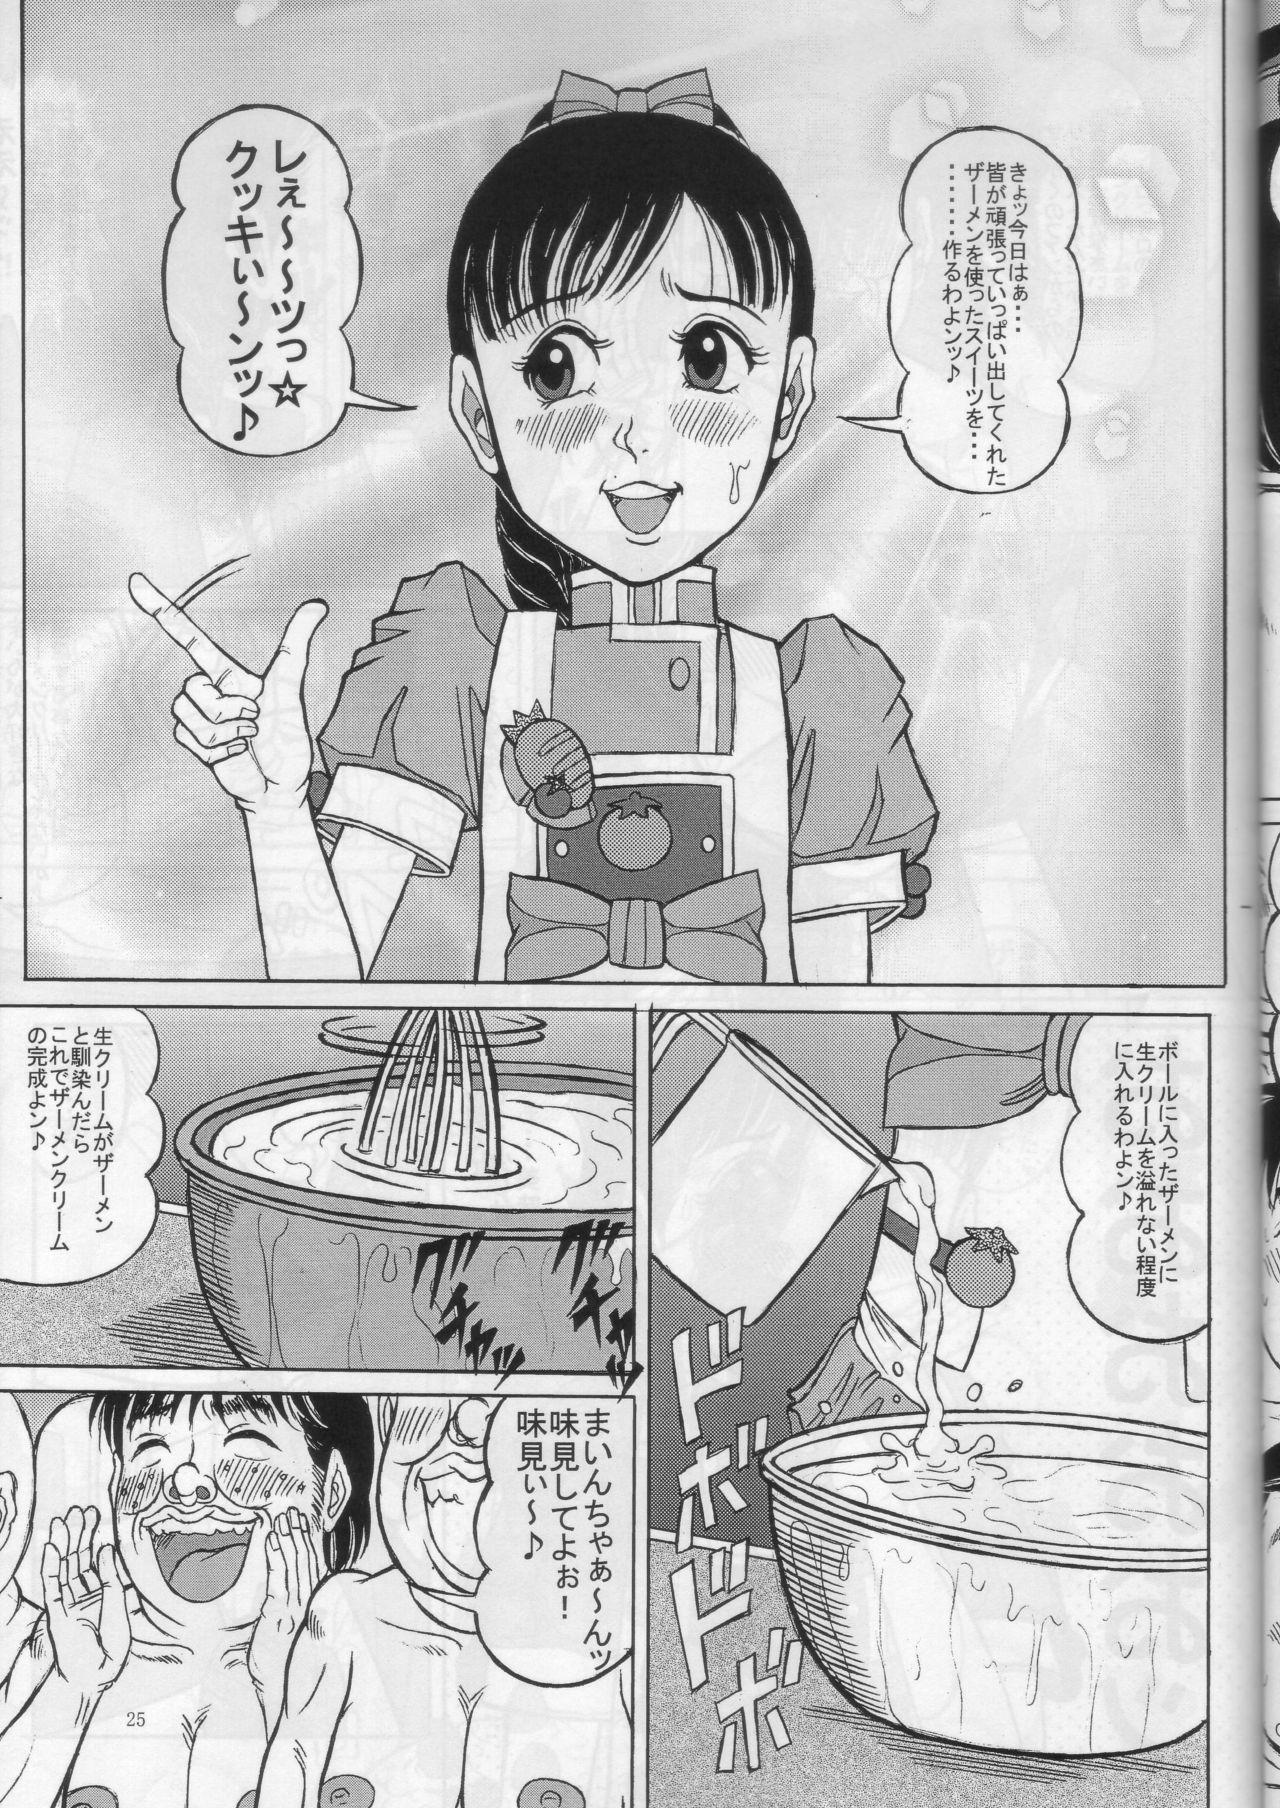 Minna de Yokumite Ara★Domo♪ Kaiseiban 23